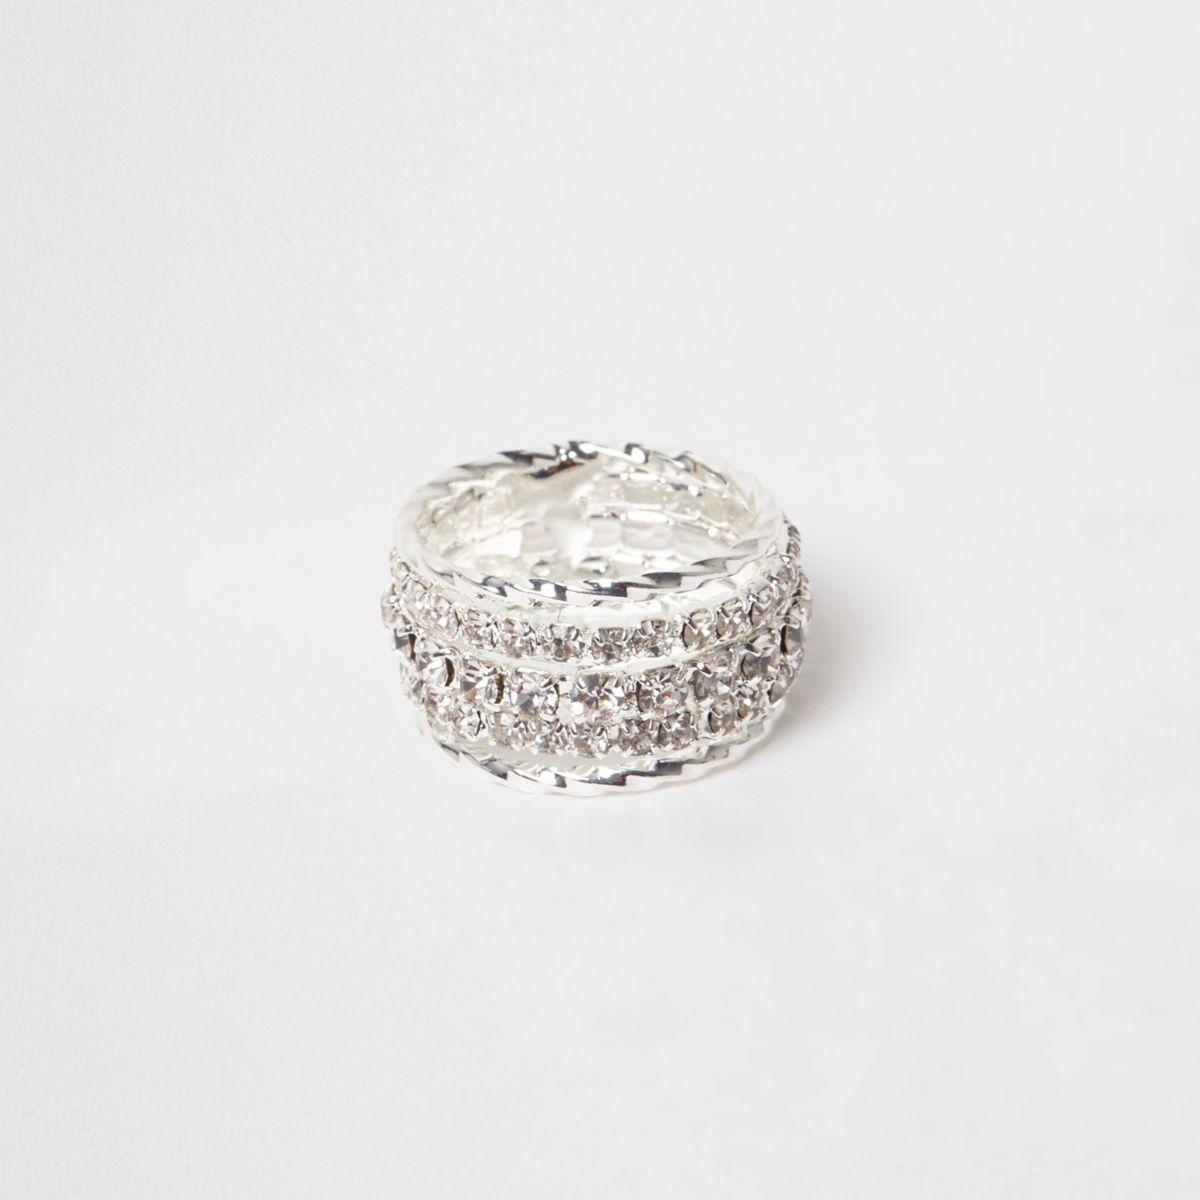 Silver tone diamante encrusted ring